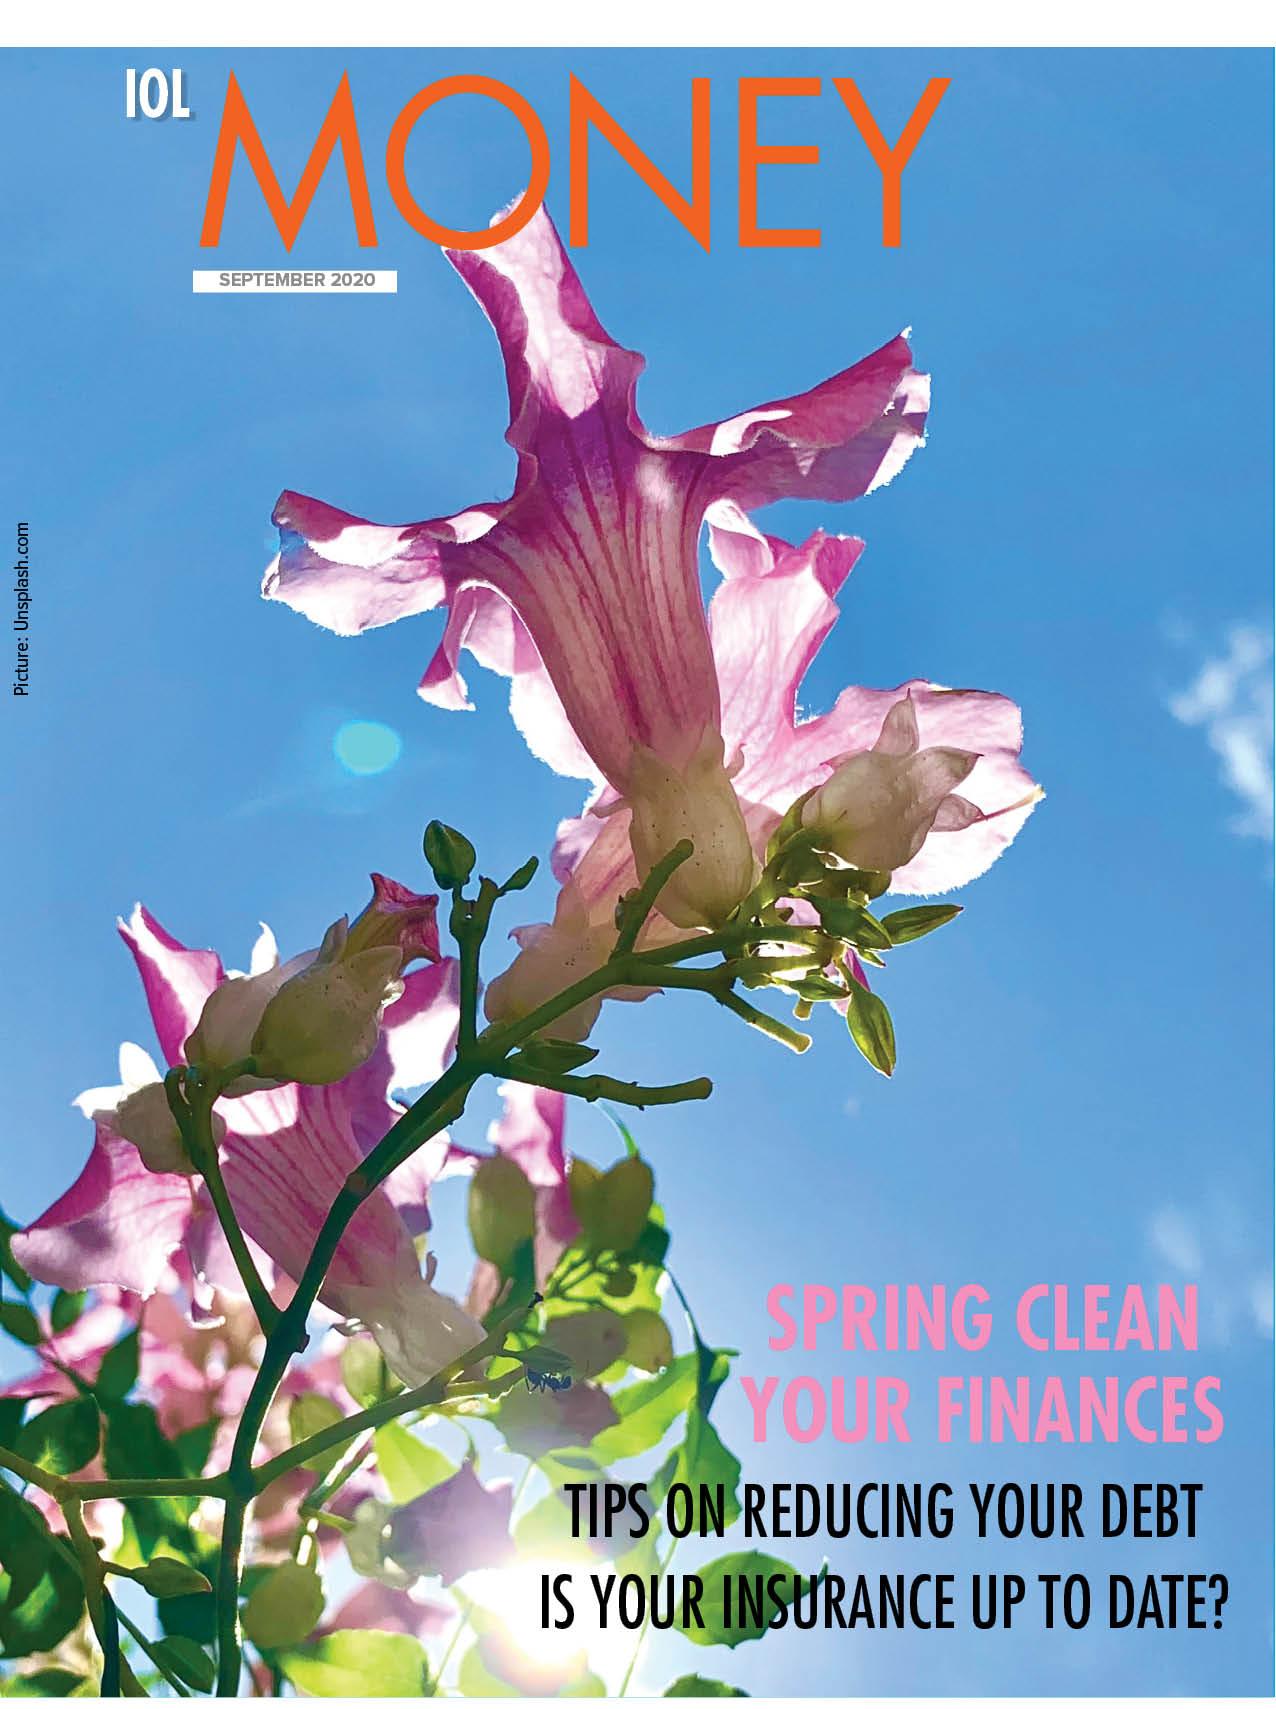 IOL Money Issue 2